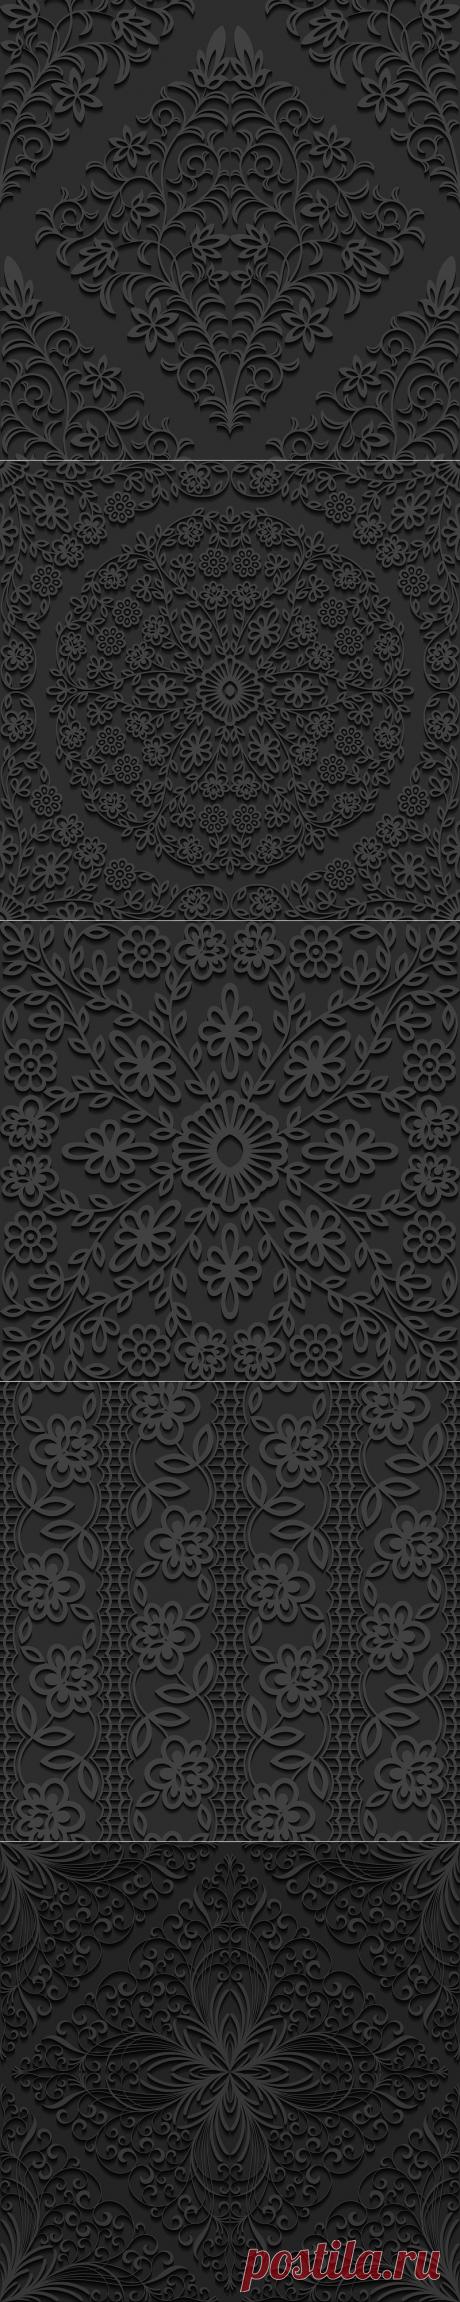 Тёмные 2D текстуры.